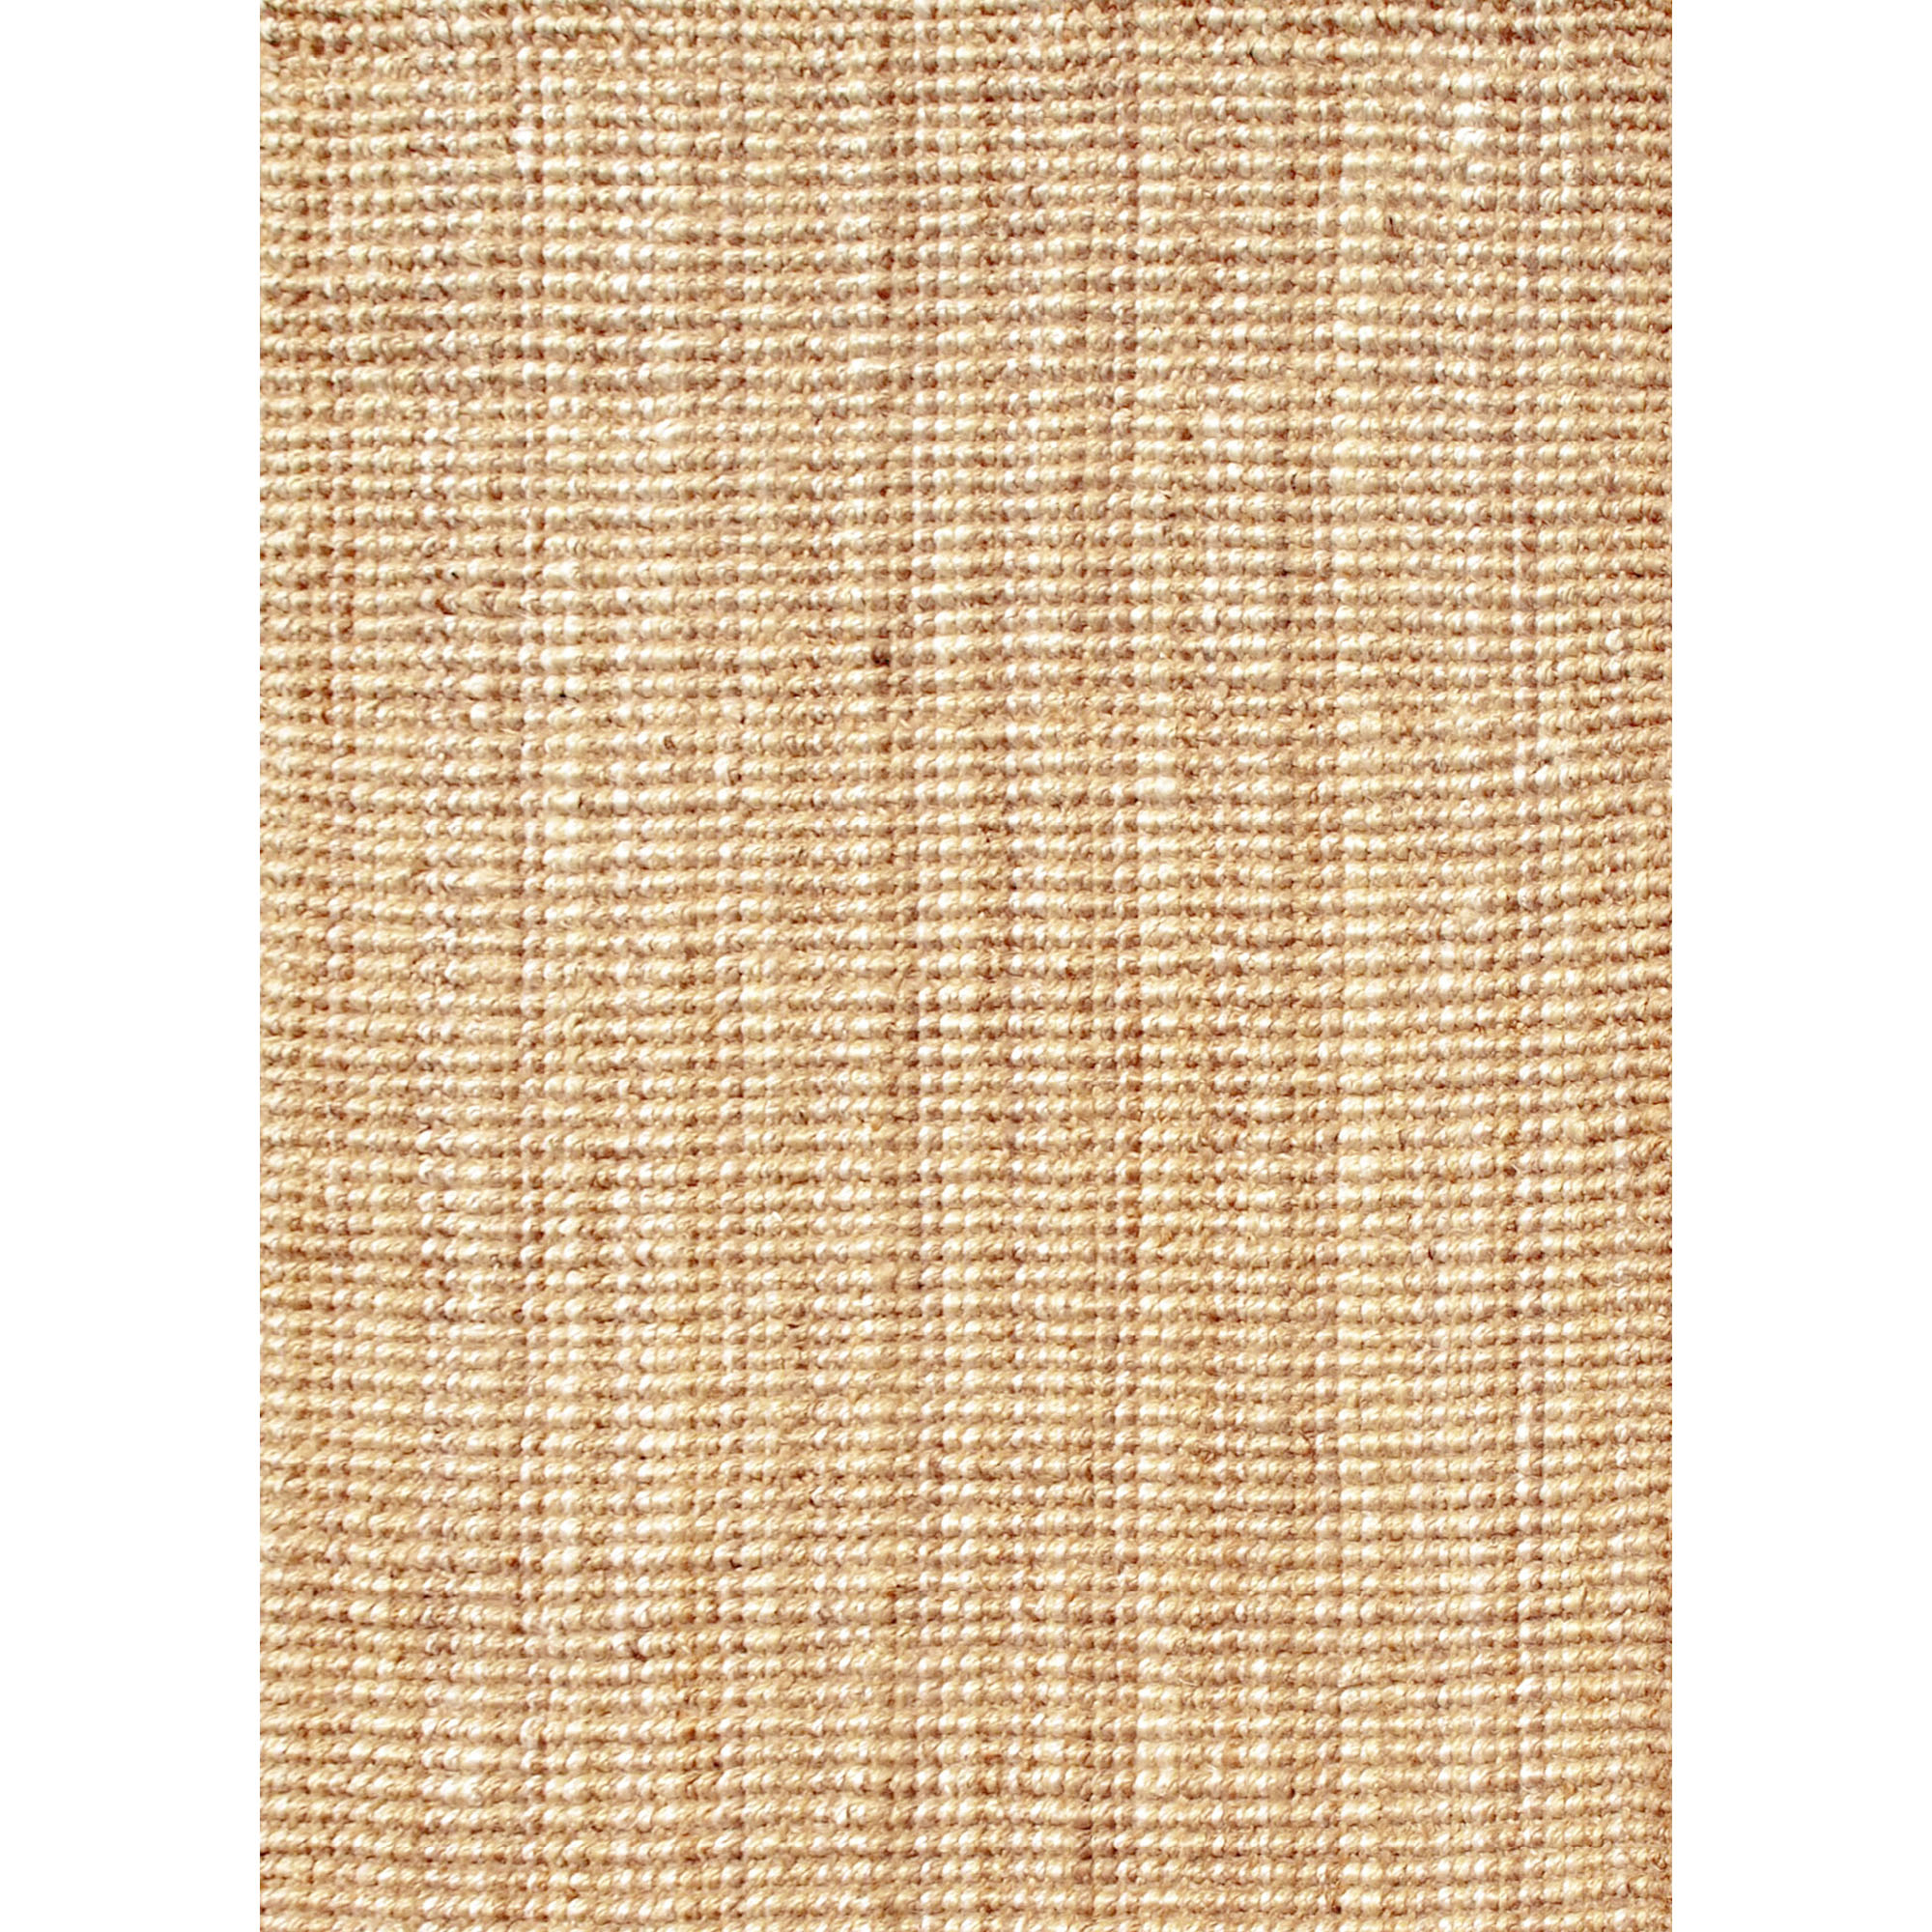 JAIPUR Rugs Naturals Lucia 5 x 8 Rug - Item Number: RUG112588